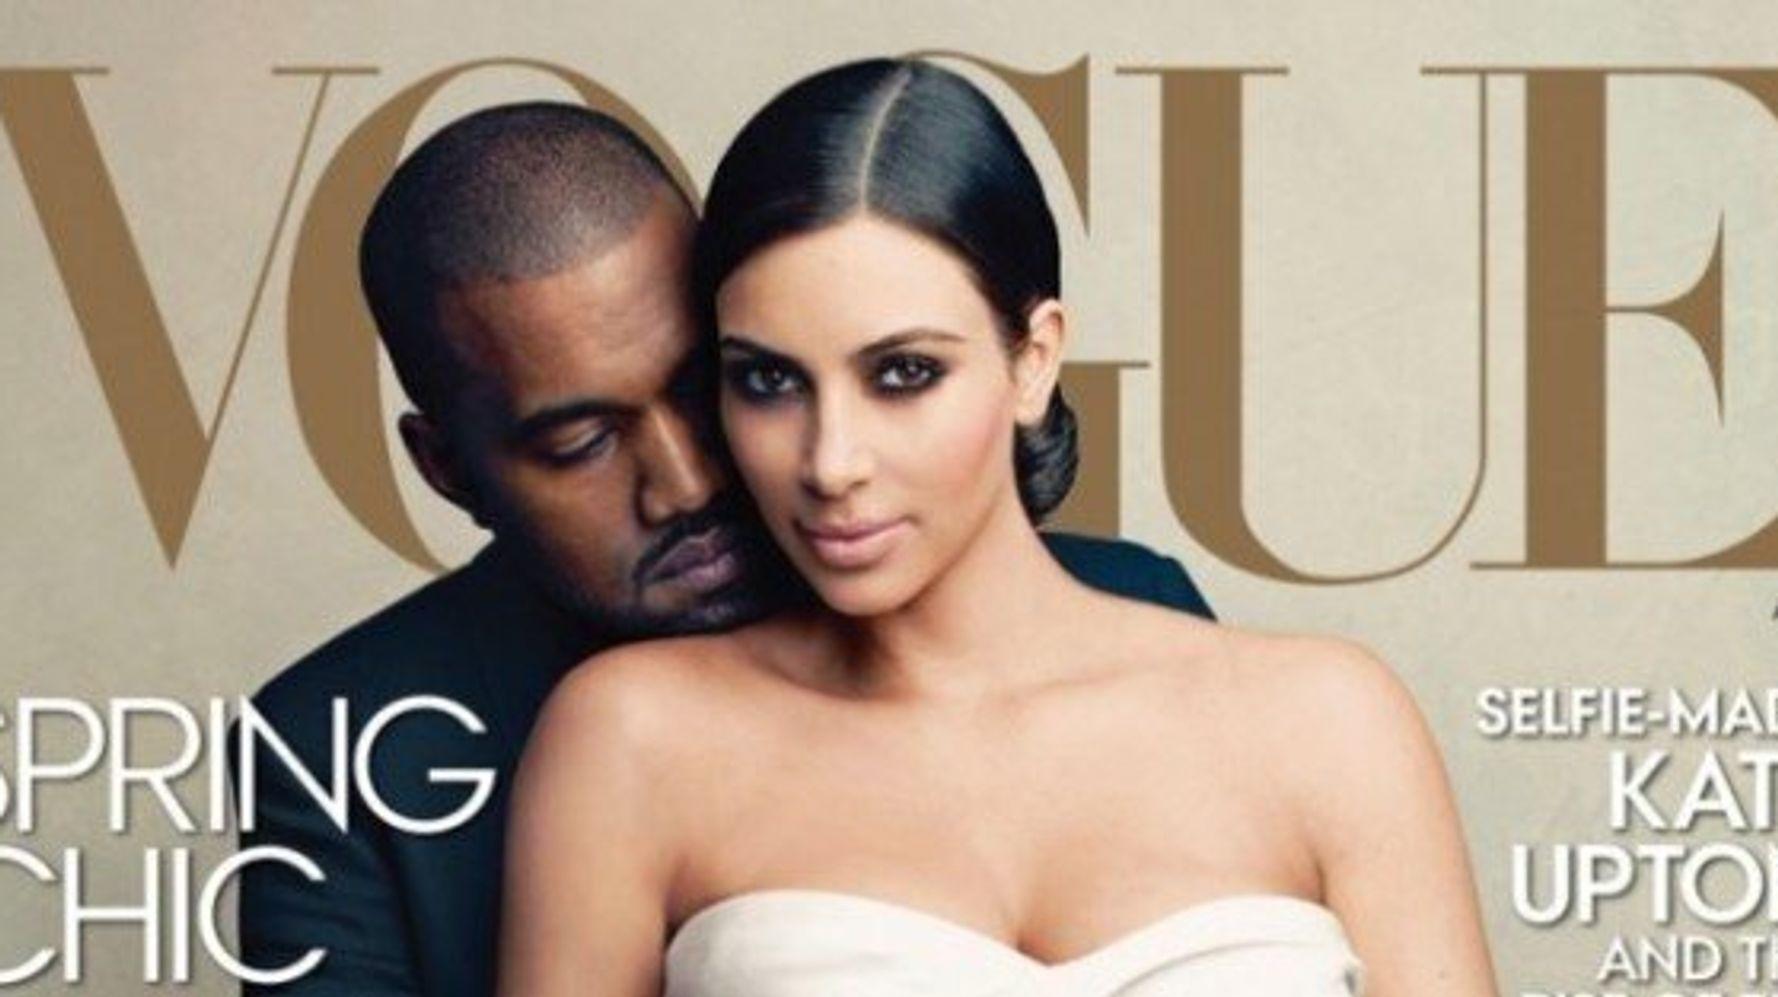 Twitter Reactions to Kim Kardashians Topless Blurred